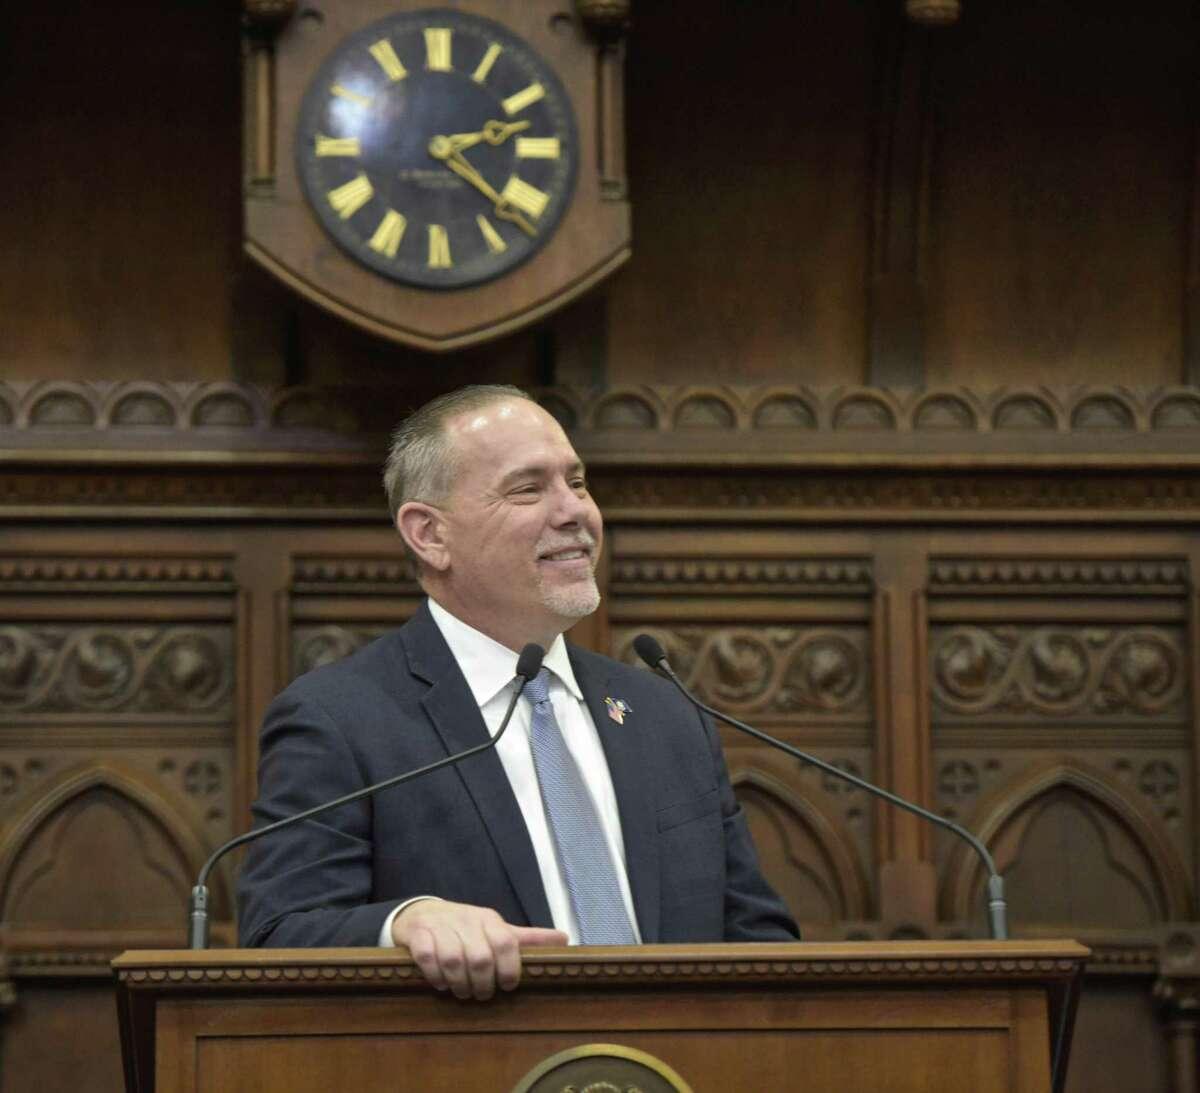 Connecticut Speaker of the House Joe Aresimowicz